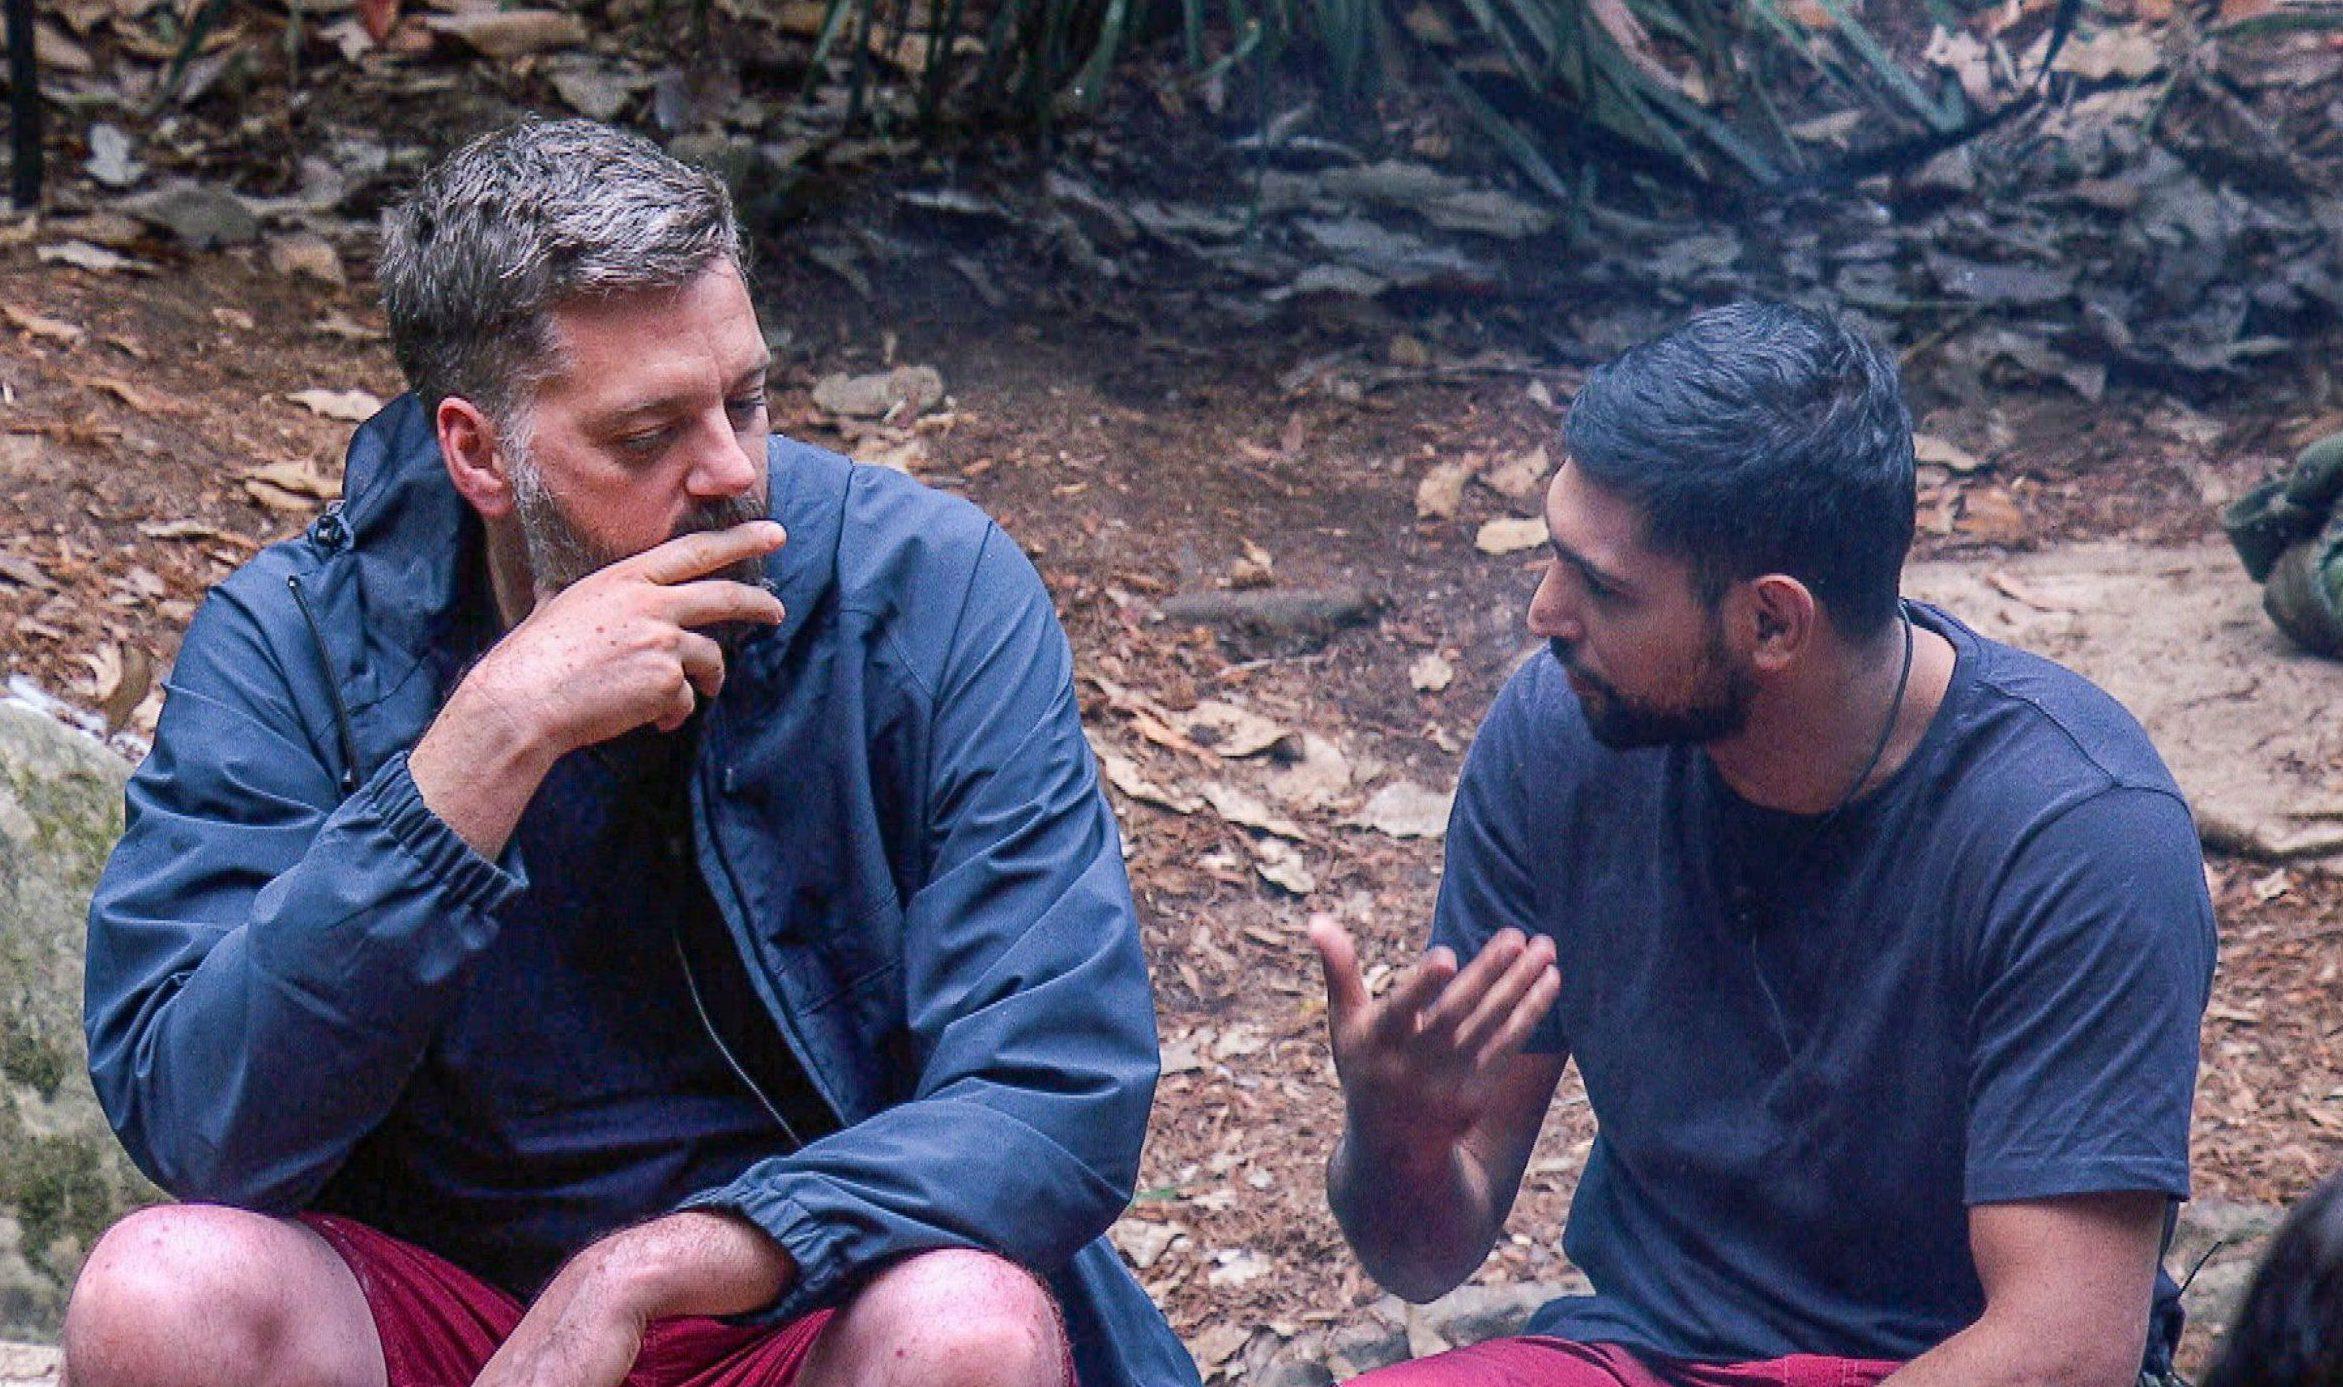 Amir Khan admits Iain Lee 'did suffer' in the I'm A Celeb jungle